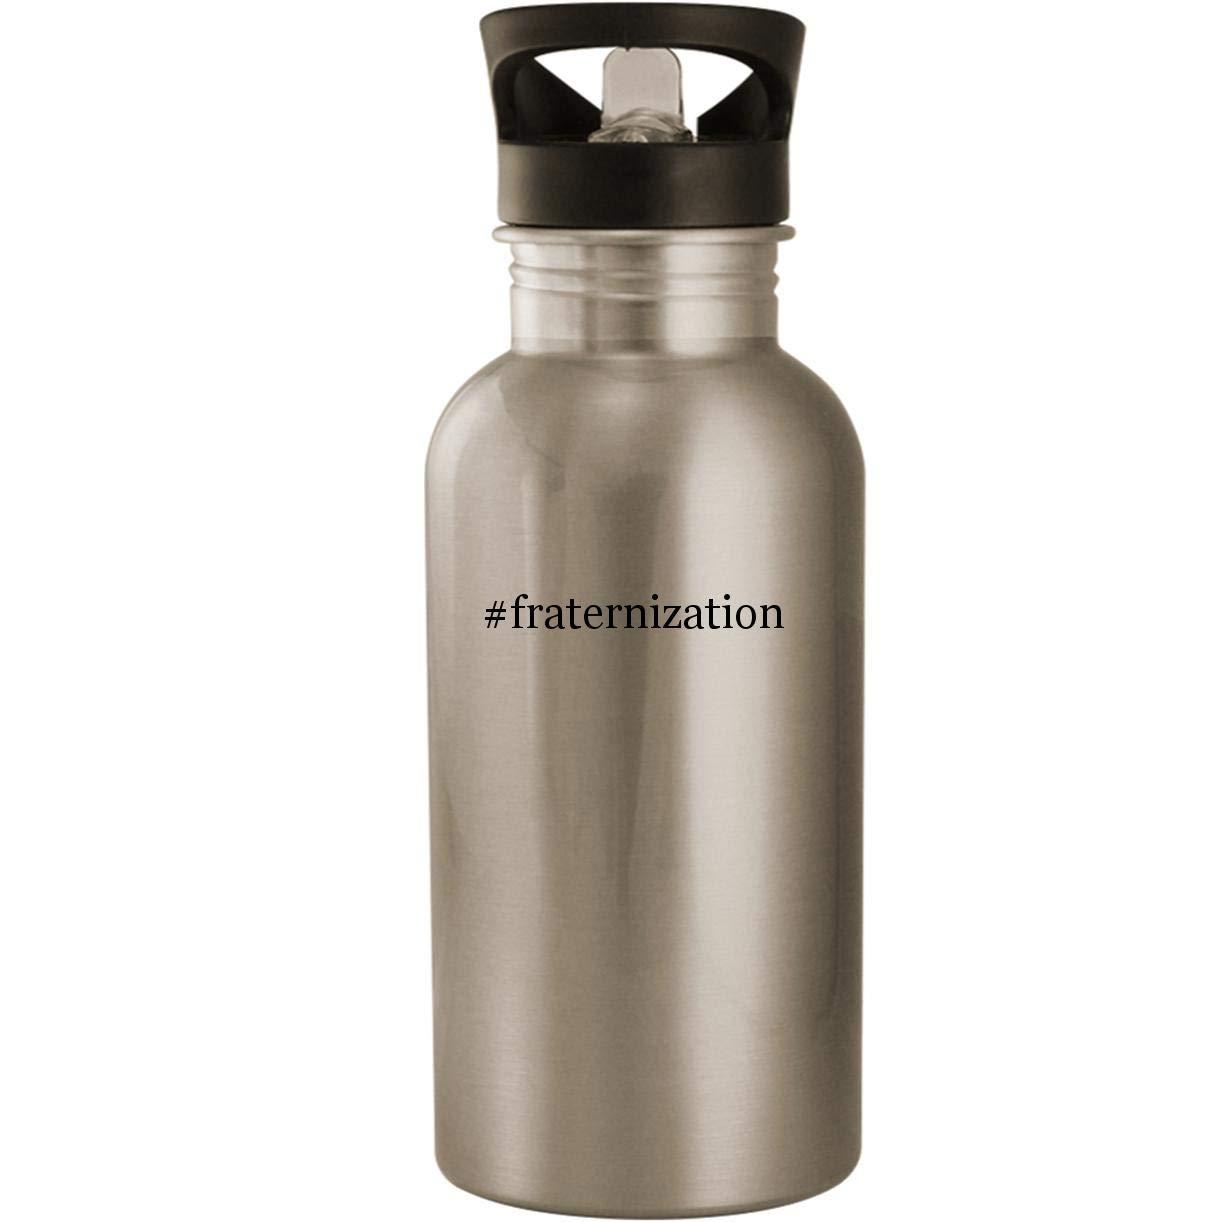 #fraternization – ステンレススチール 20オンス ロードレディウォーターボトル シルバー US-C-07-18-02-022591-04-26-18-26 B07GN9GP1D シルバー